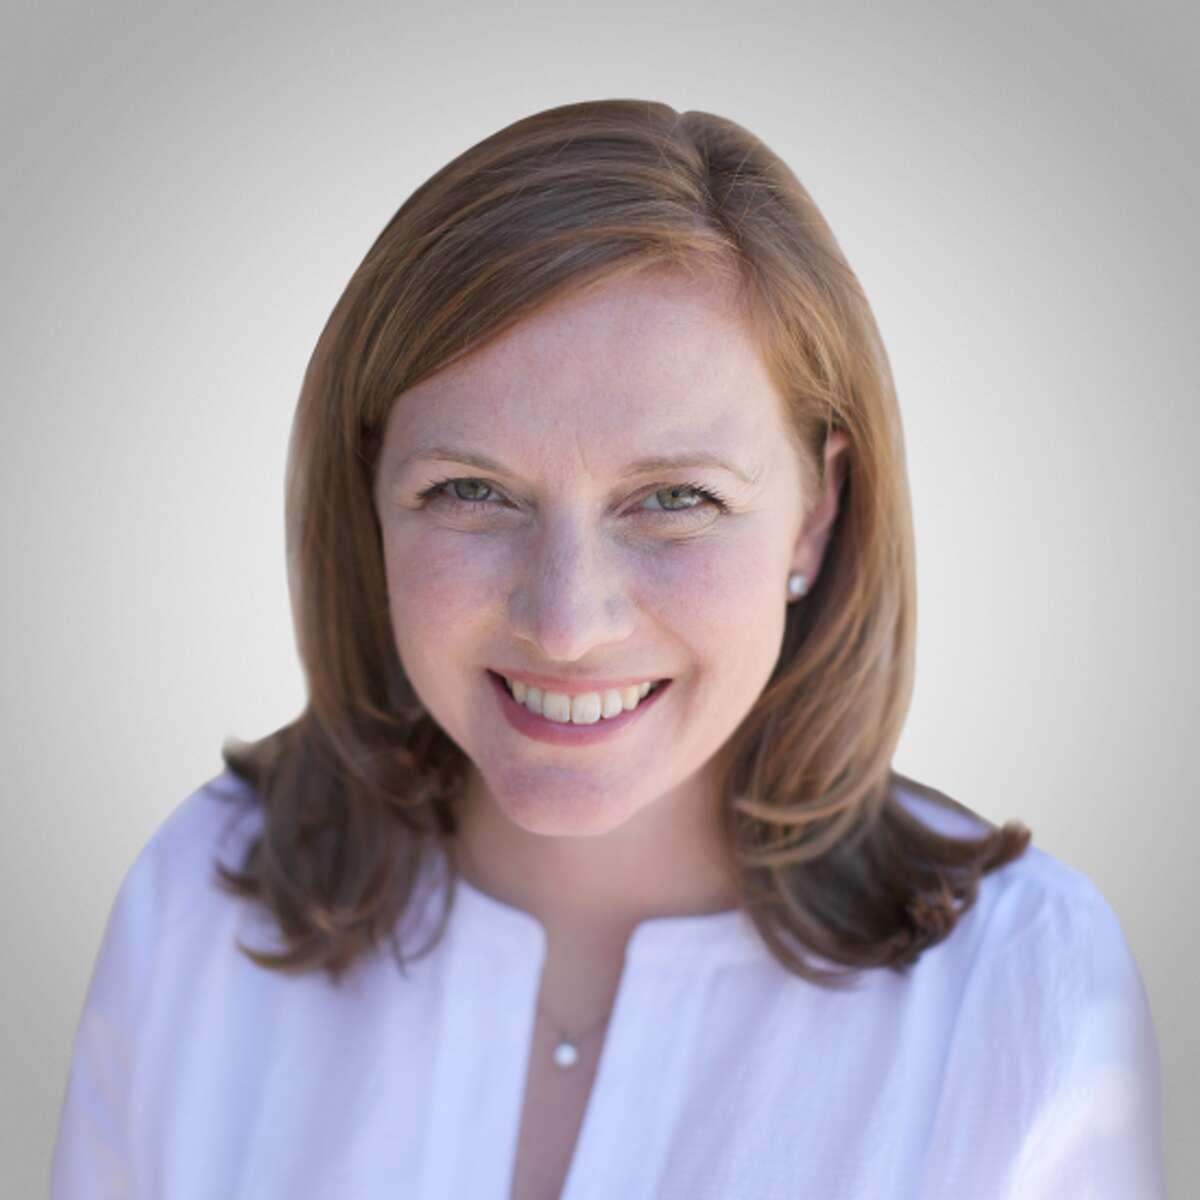 Lizzie Pannill Fletcher, candidate for U.S. Representative District 7.